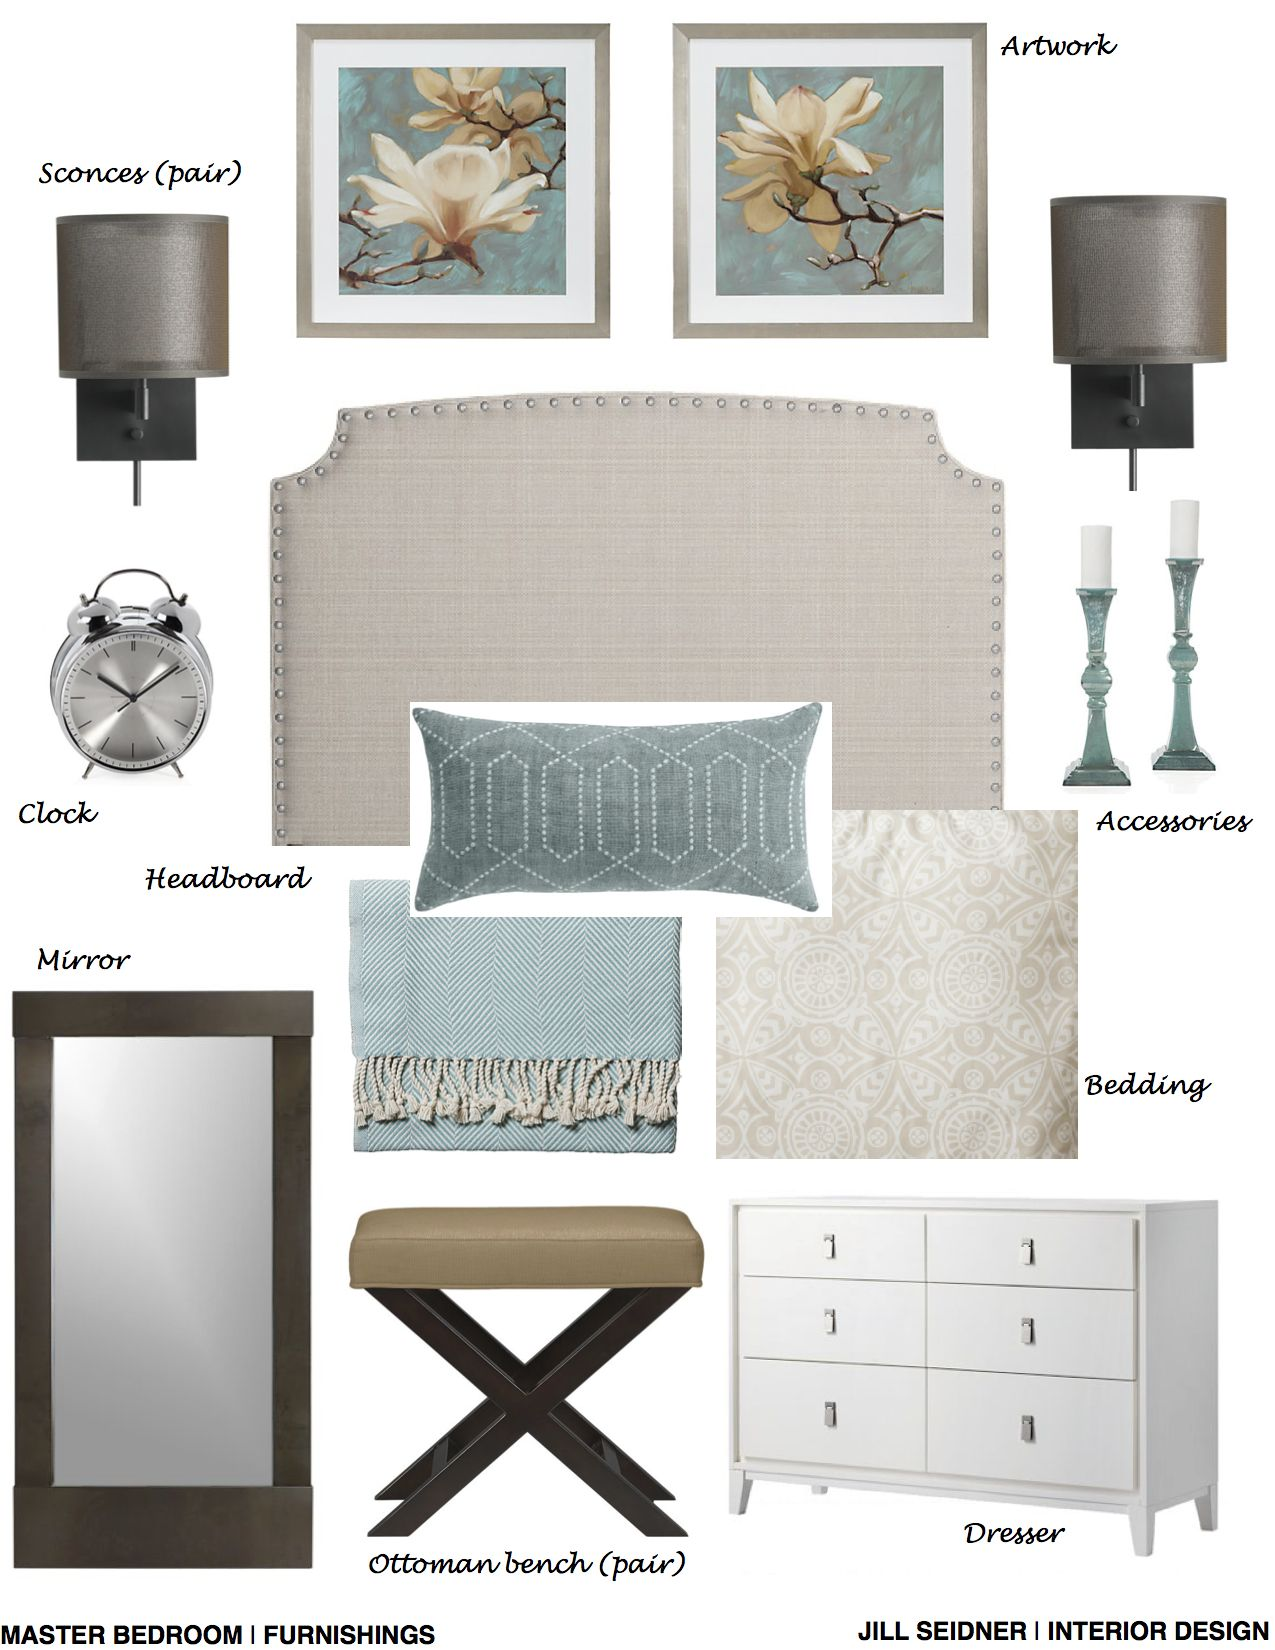 Long Beach Ca Online Design Project Master Bedroom Furnishings Concept Board Interior Design Bedroom Interior Design Boards Interior Design